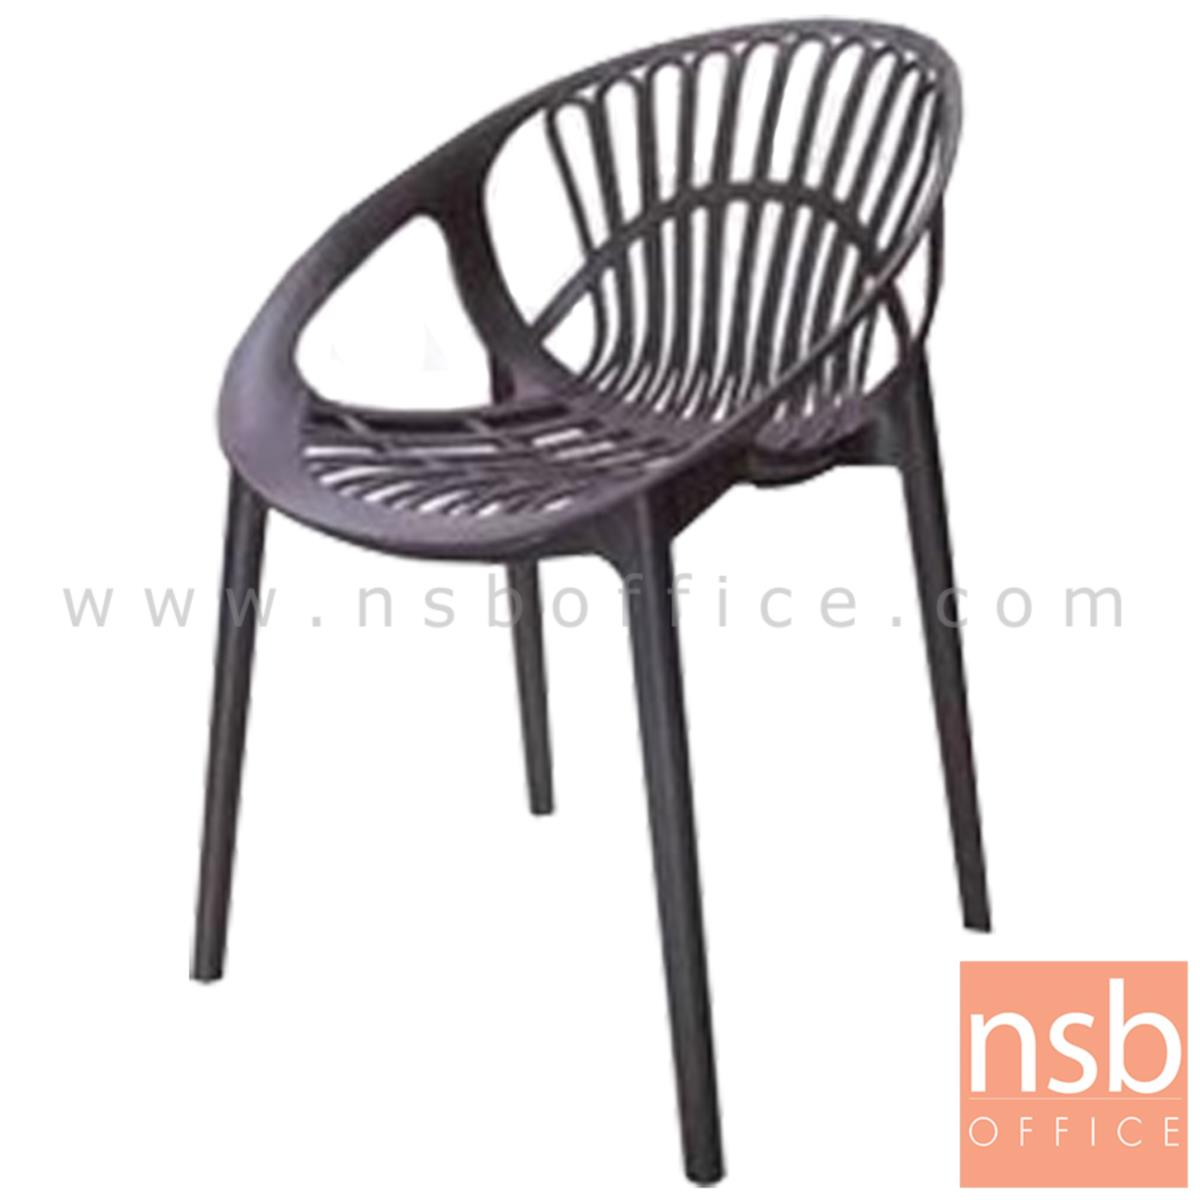 B11A040:เก้าอี้โมเดิร์นพลาสติกล้วน รุ่น DOLPHIN (ดอลฟิน) ขนาด 48W cm.